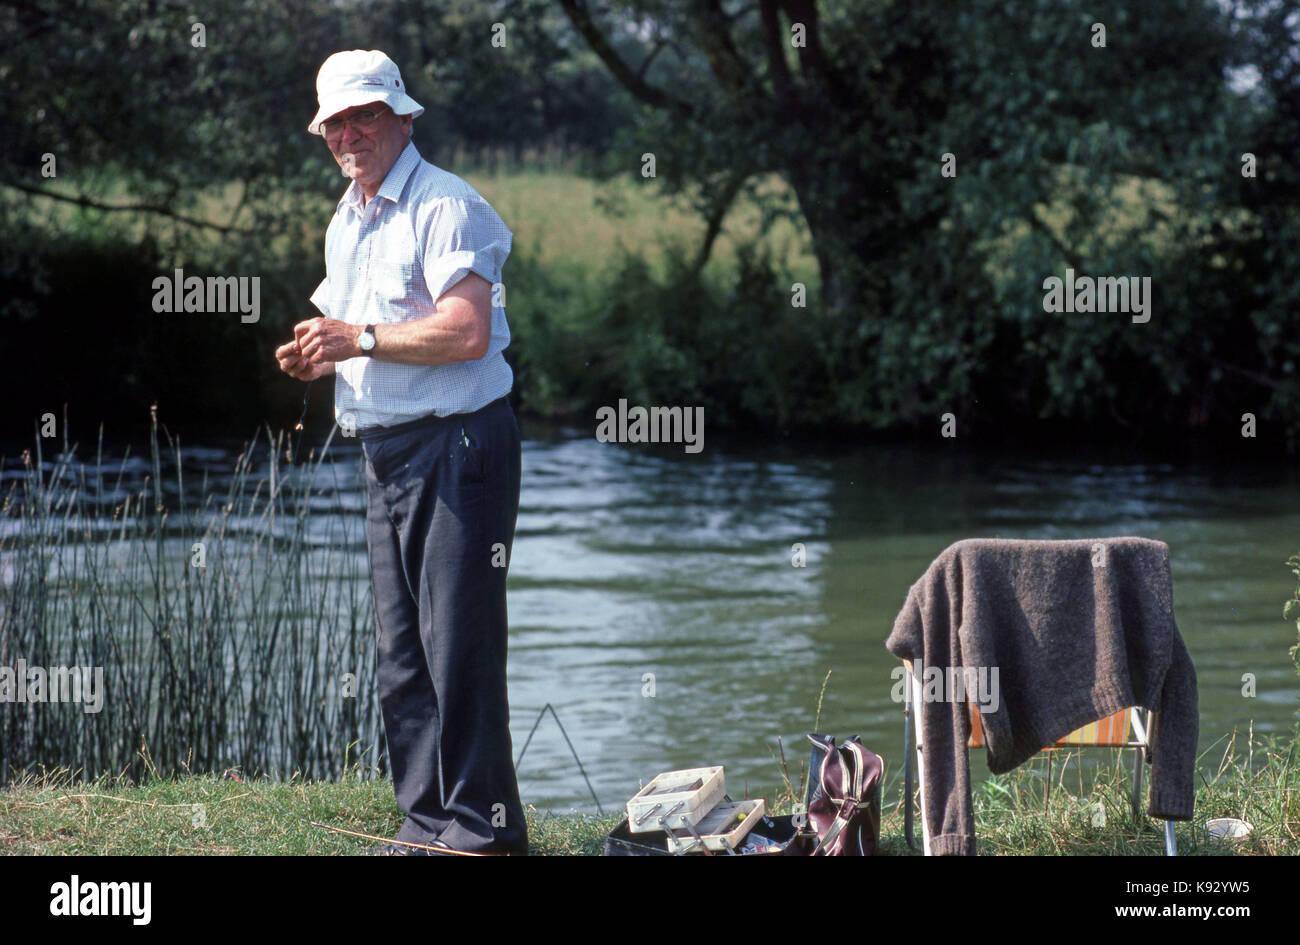 elderly man on a river bank fishing and smiling enjoying himself - Stock Image